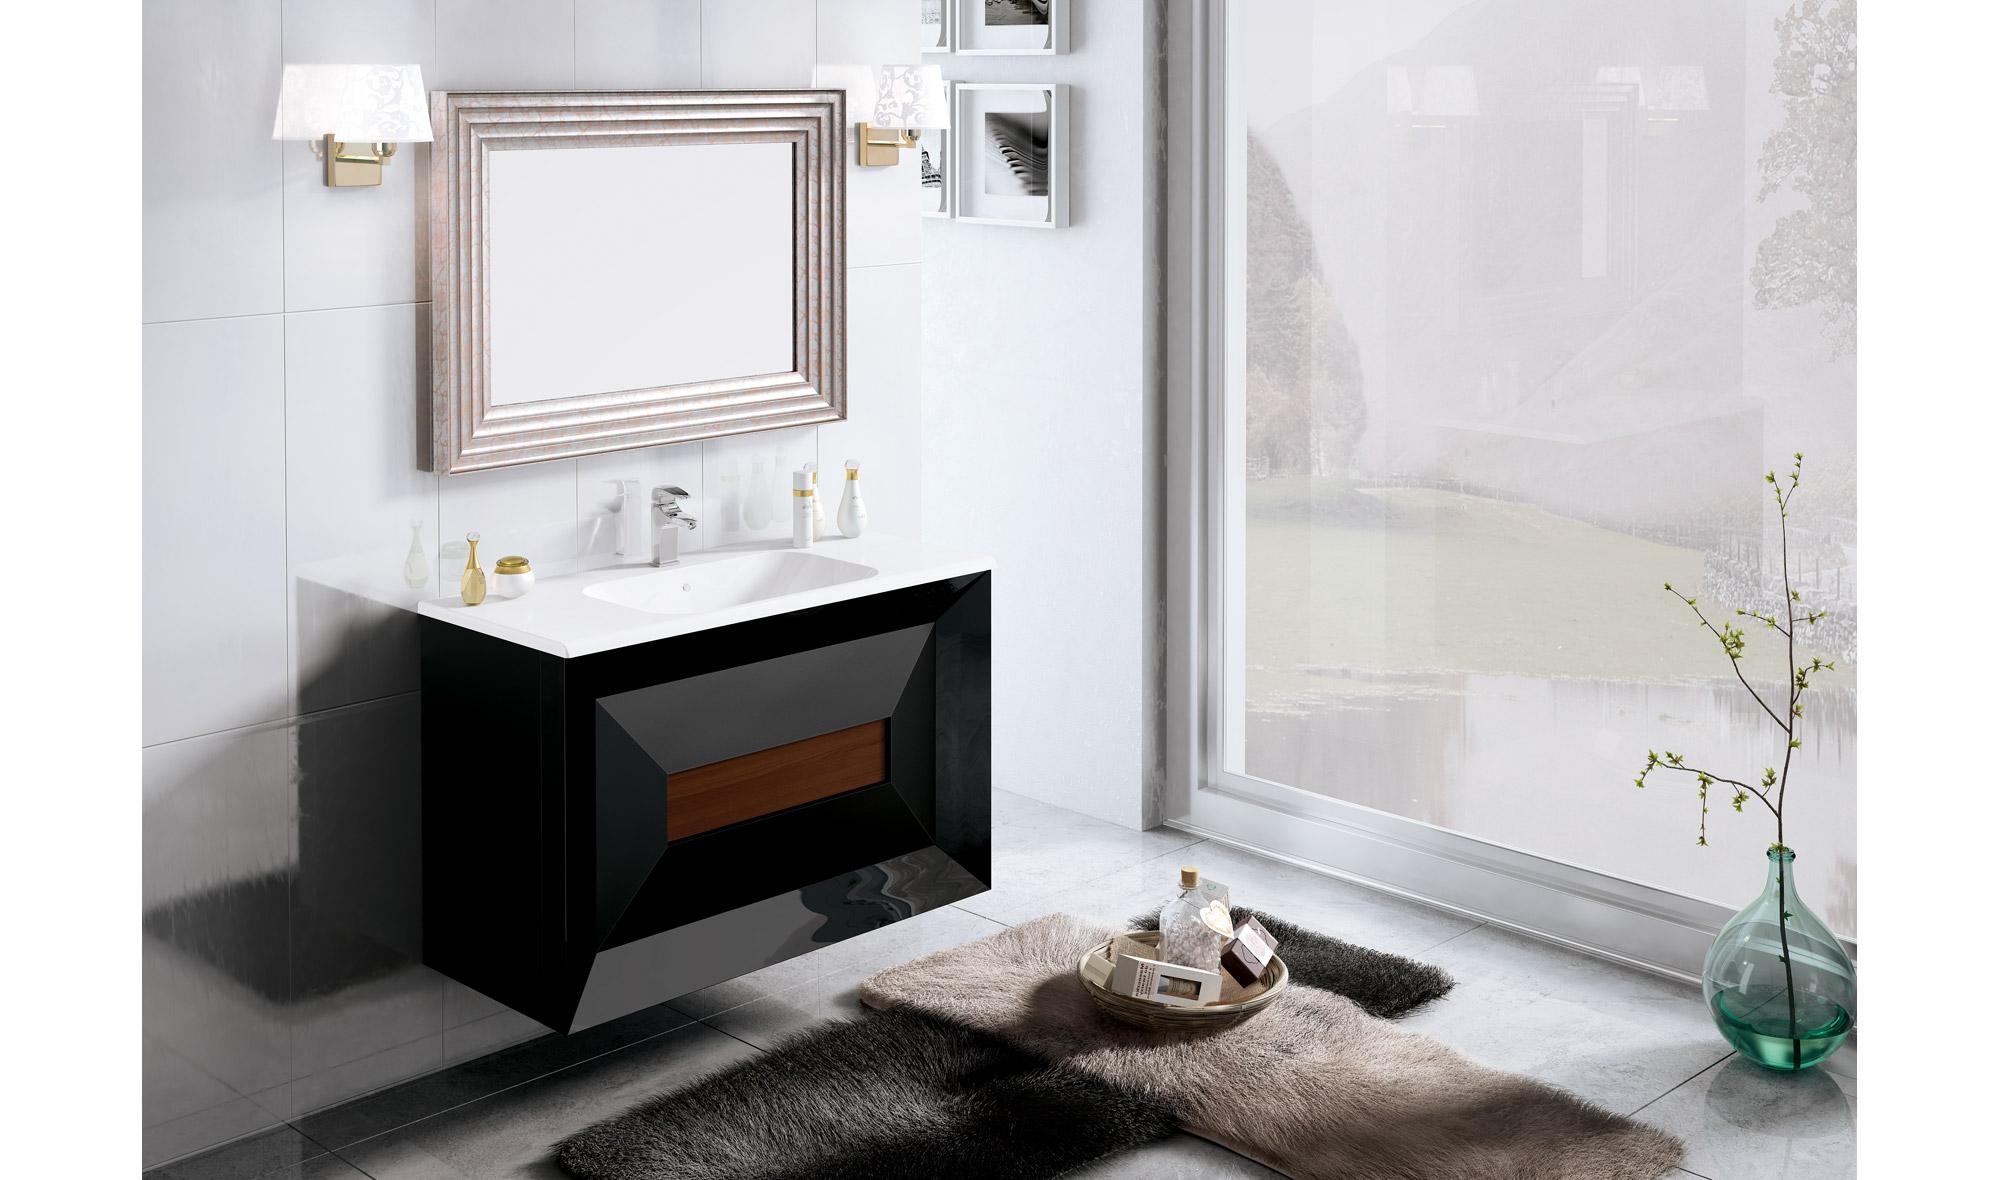 Muebles De Baño Nou Decor:Mueble de baño design Cubik en Portobellostreetes